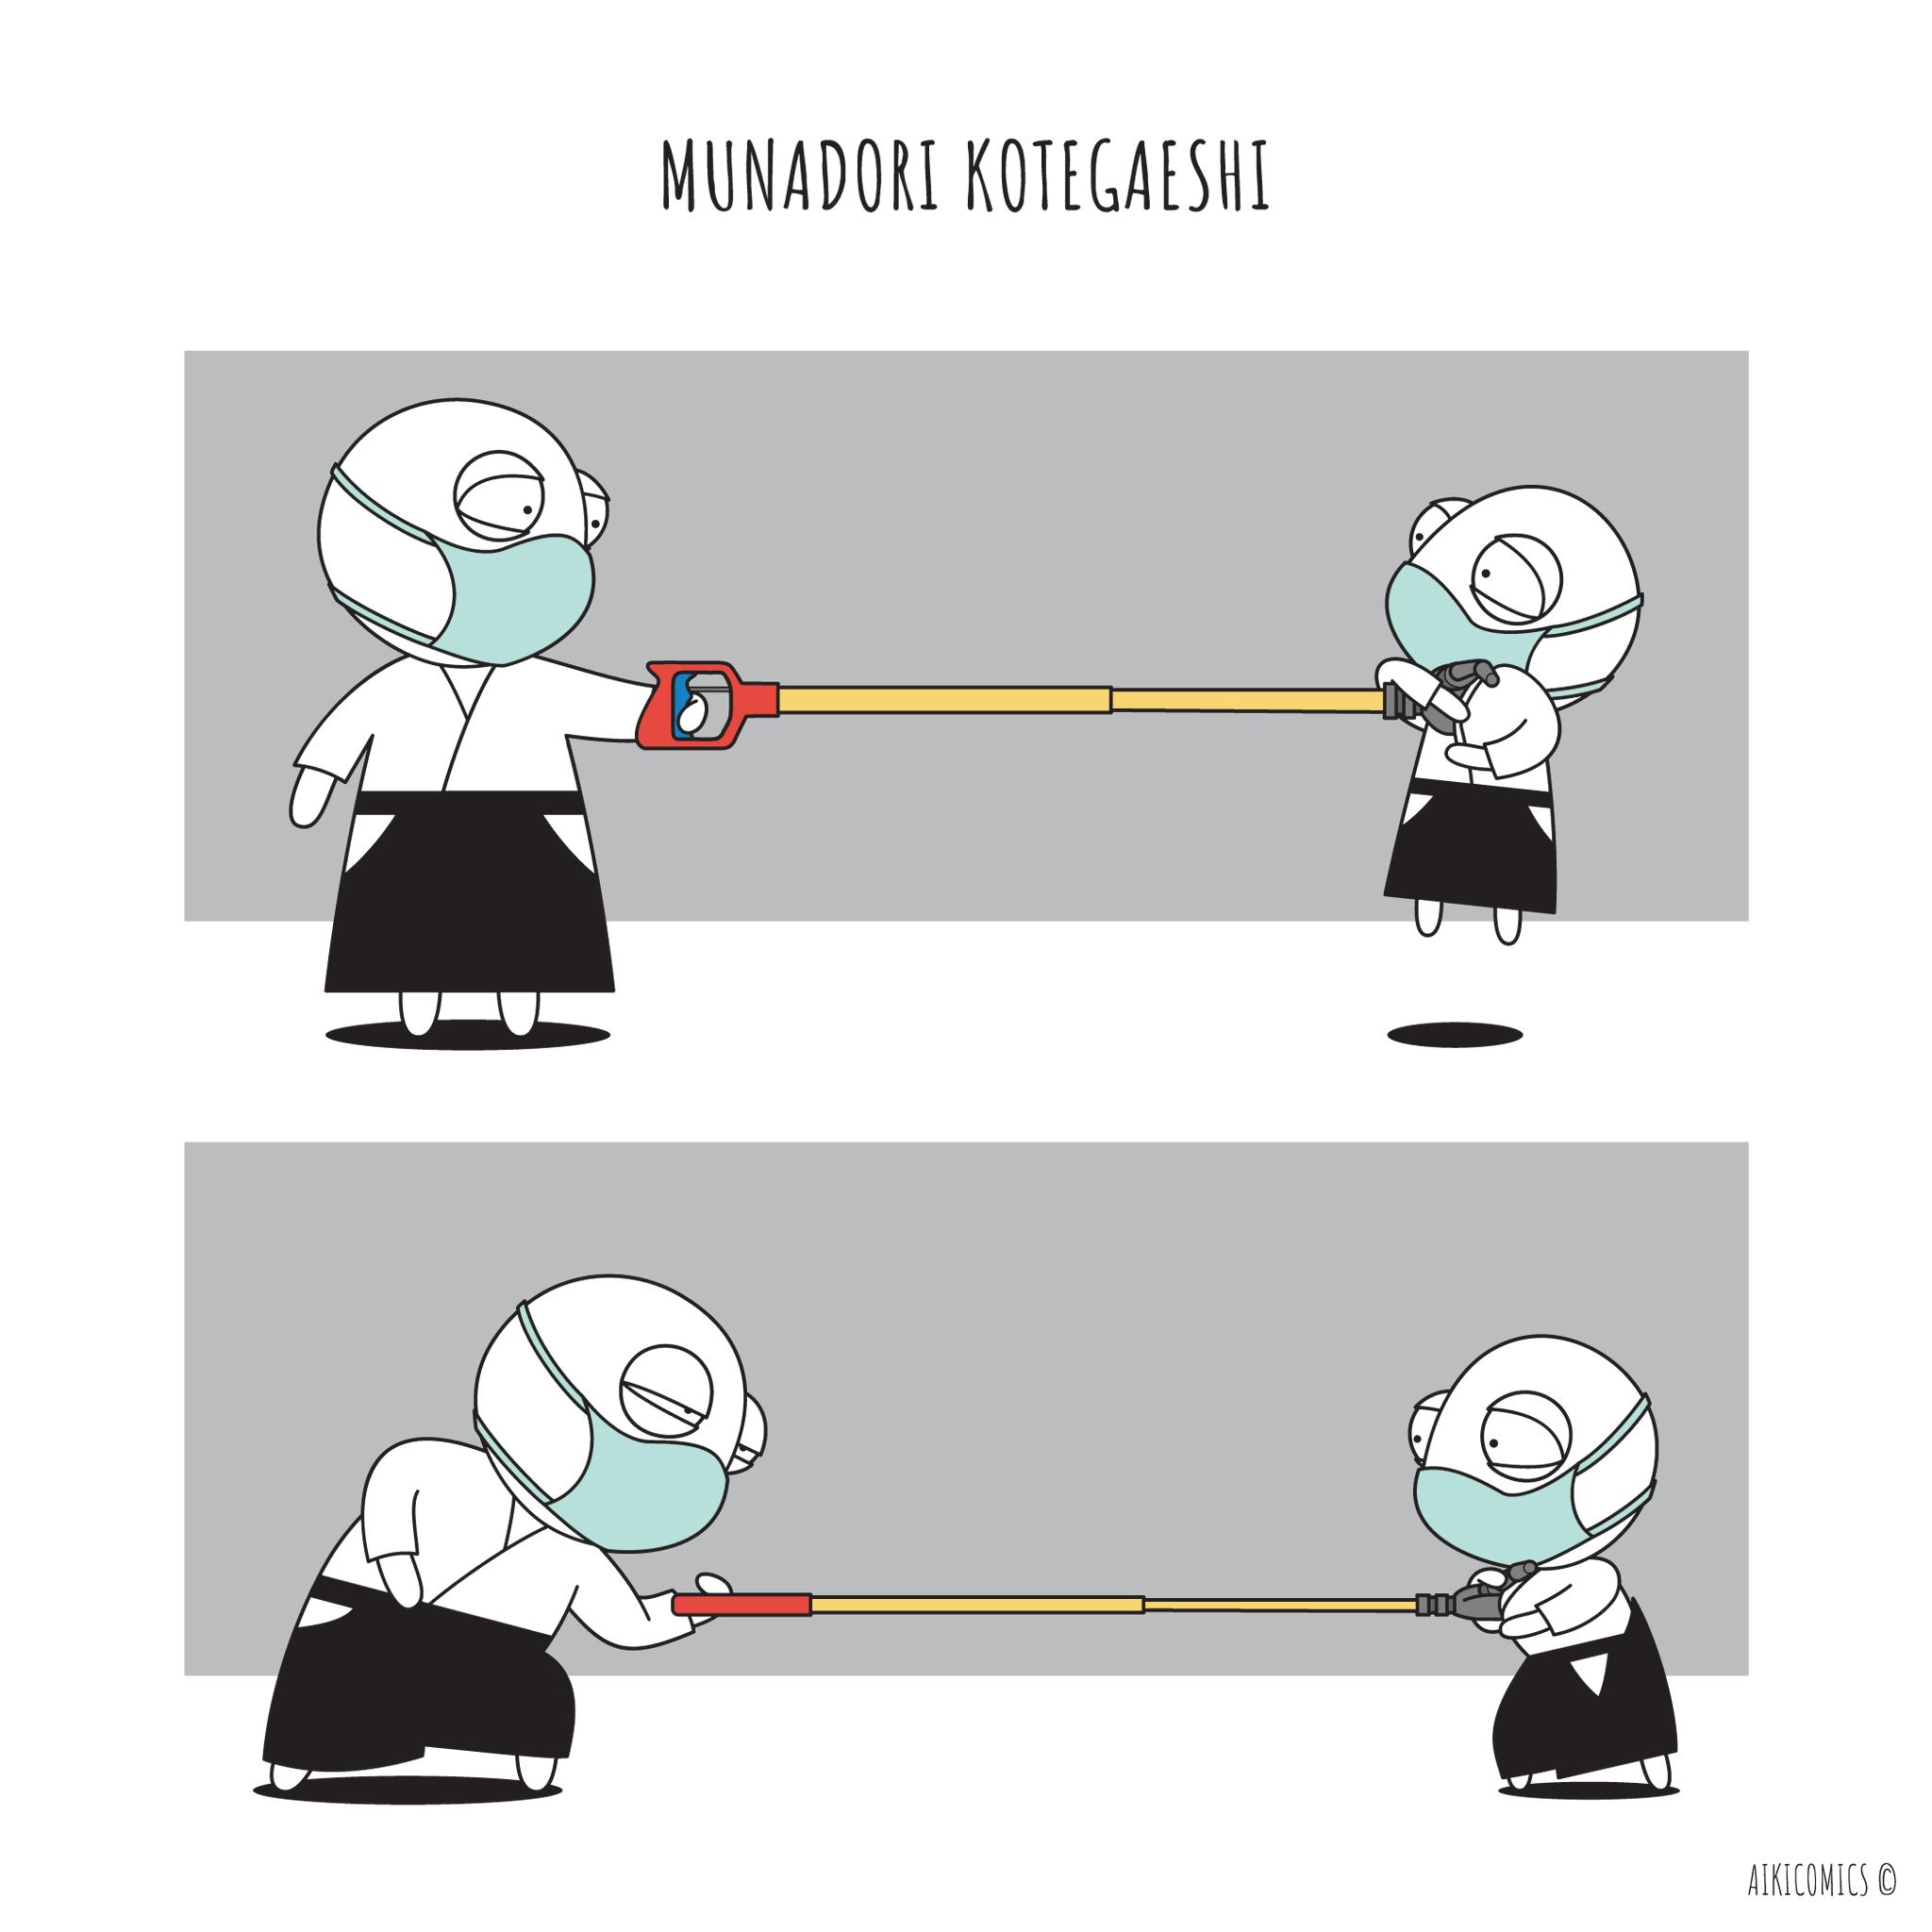 No-contact Kotegaeshi would work great from my no-contact Munadori… :)  #munadori #kotegaeshi #aikido #martialarts #comics #cartoon #humor #oritshilon #aikicomics #selfdefense https://t.co/IYTMbyJjSg